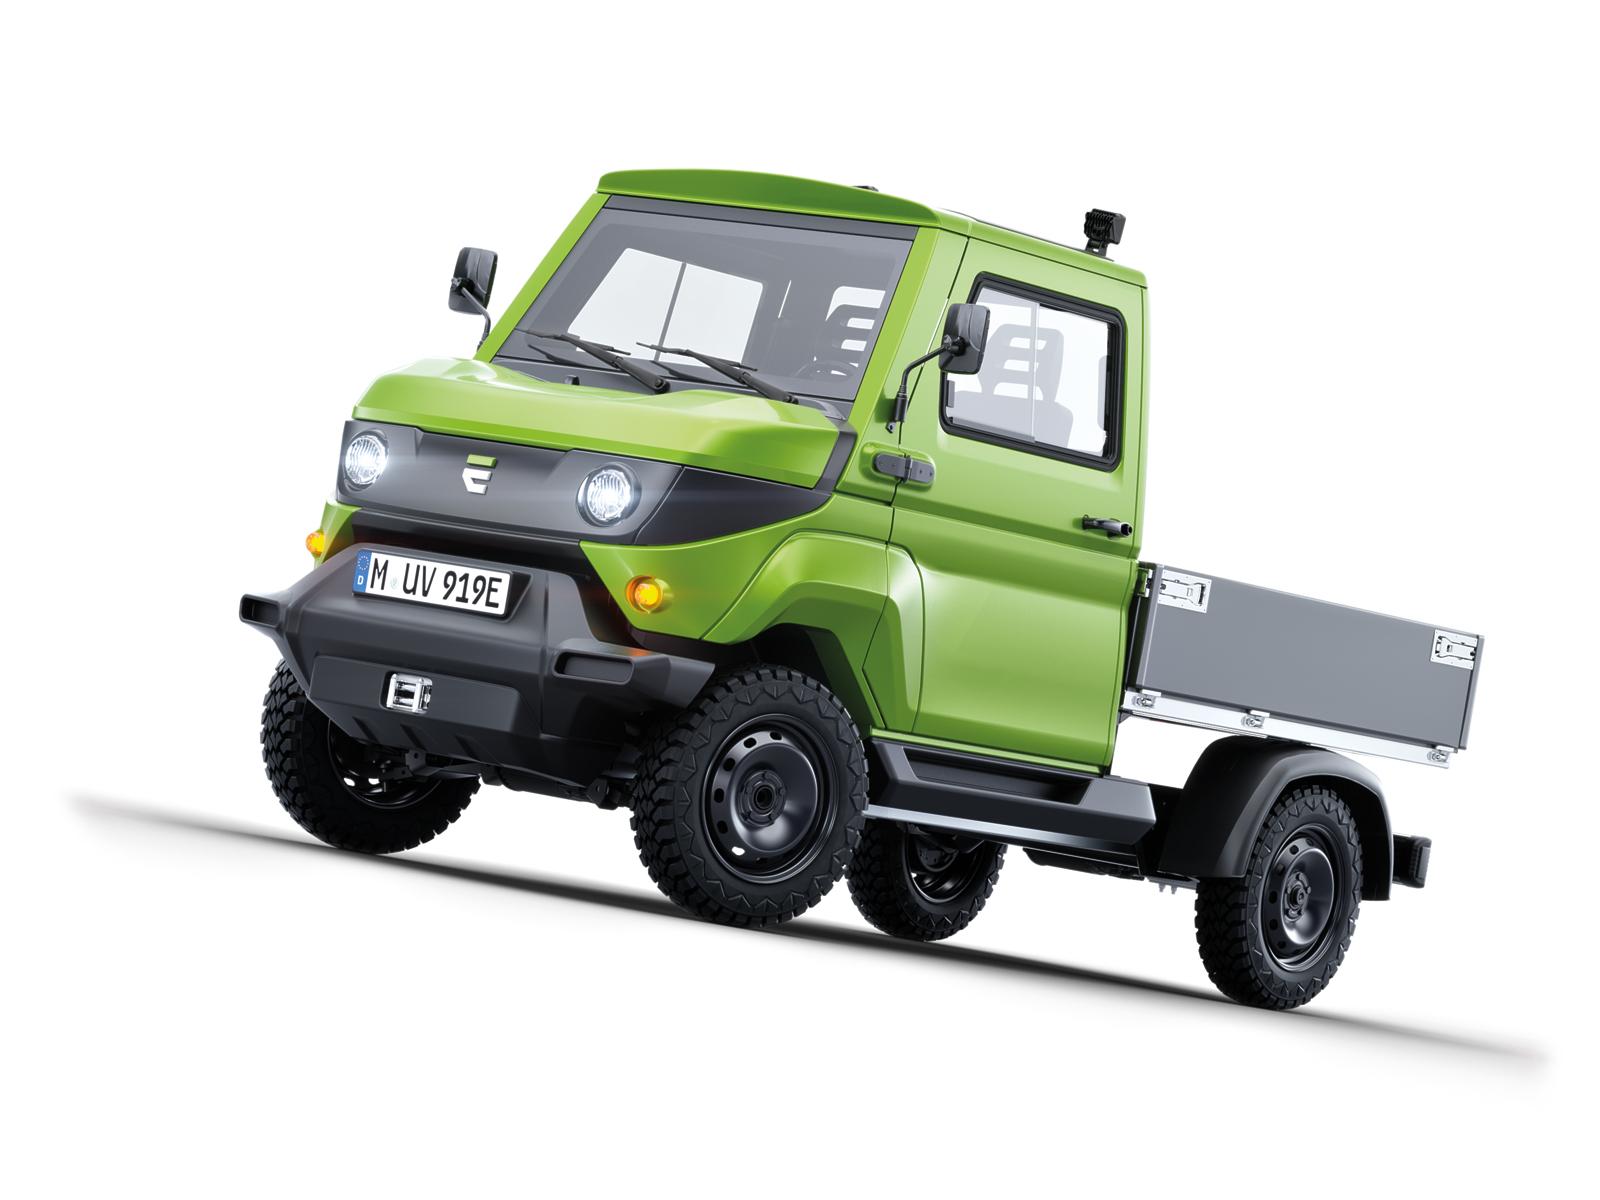 Four-wheel electric drive truck: EVUM Motors presents its new aCar at the IAA